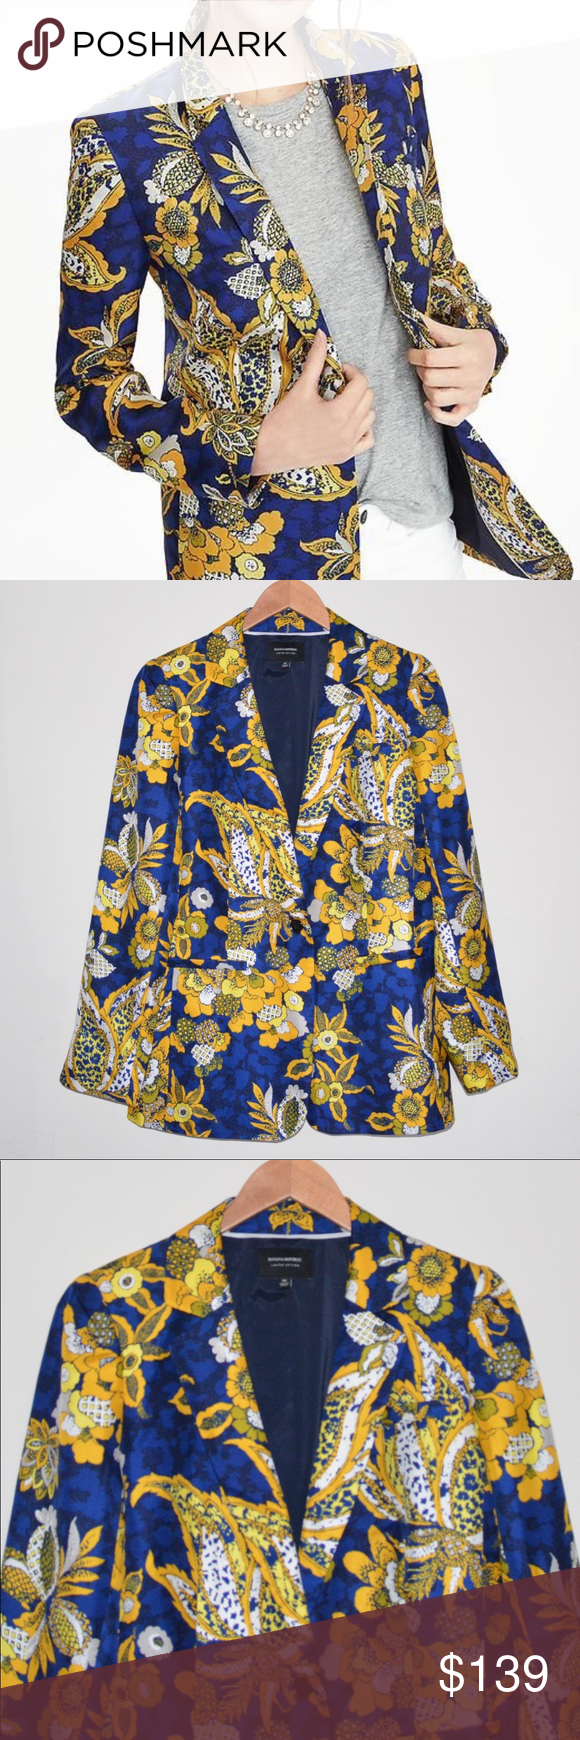 Banana Republic Avery Women's Floral Jacket NWOT Floral